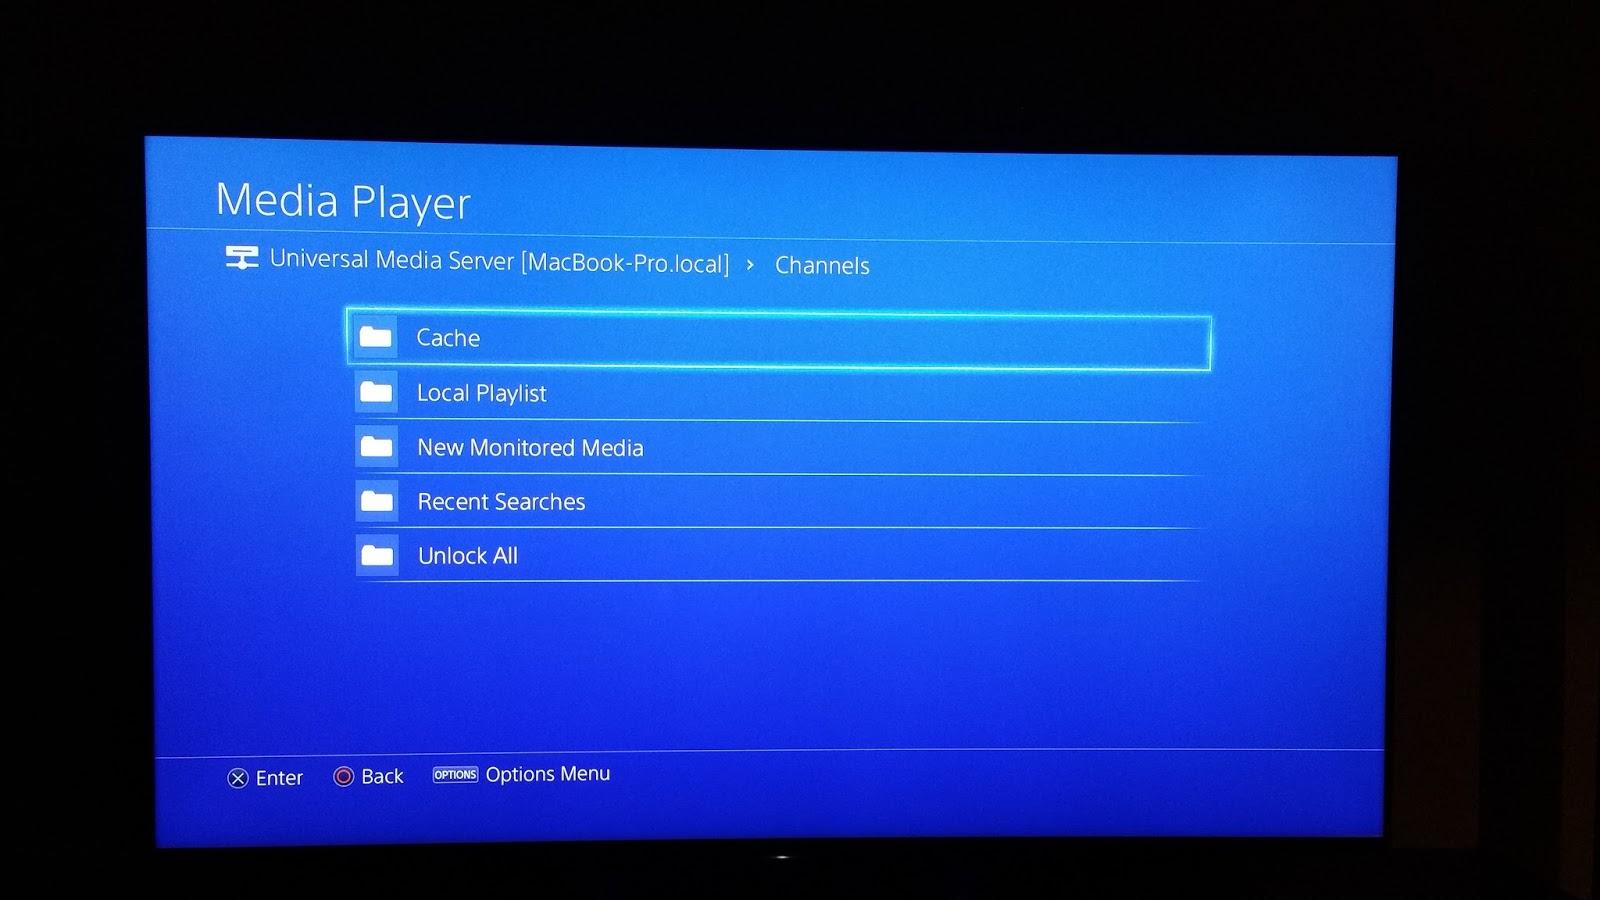 Finally!! Streaming media to the PS4 via the Media Player